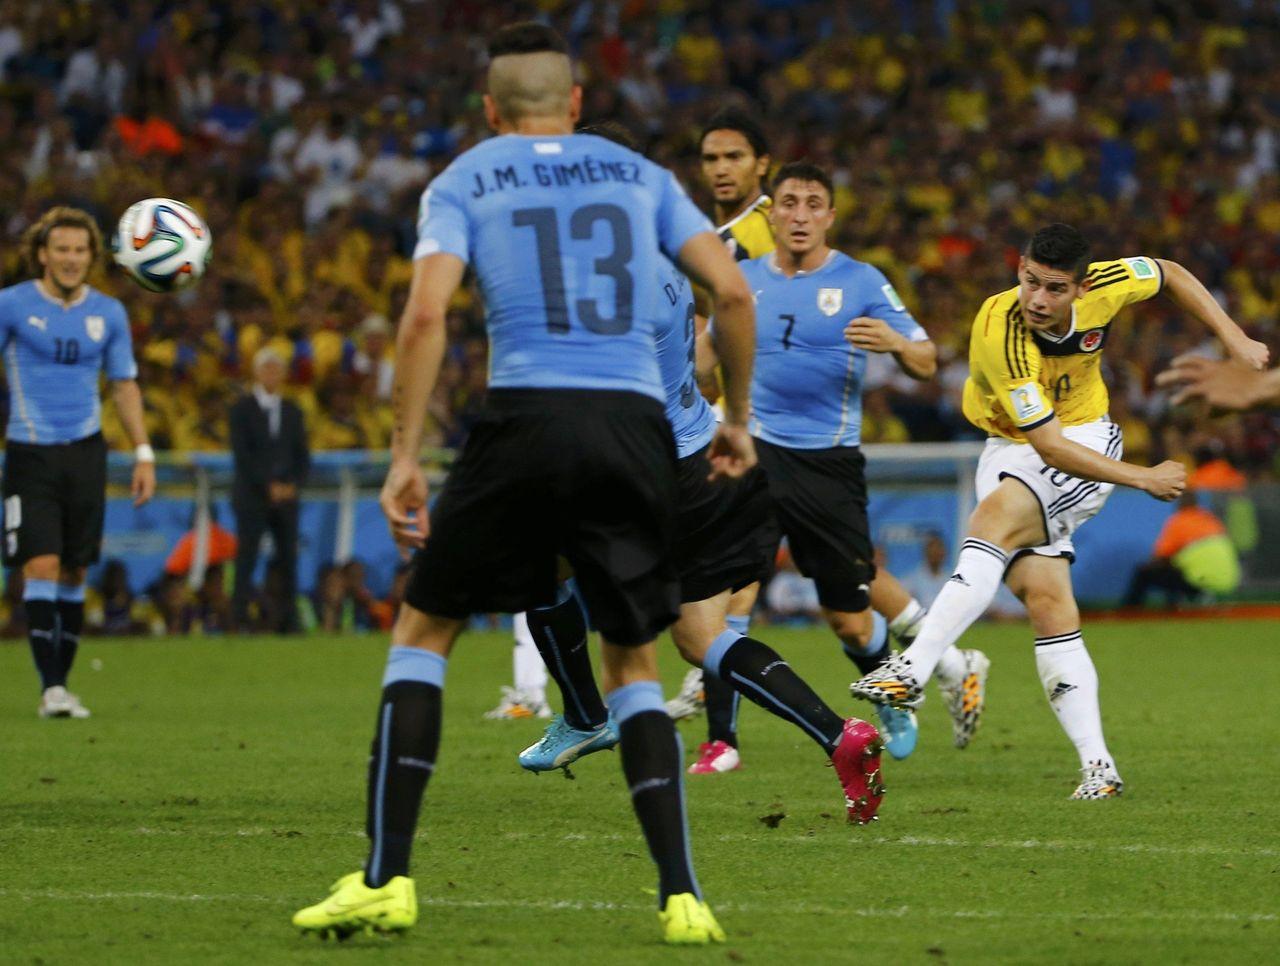 https://www.jewajua.com/wp-content/uploads/2014/07/James-Rodriguez-dhidi-ya-Uruguay.jpg